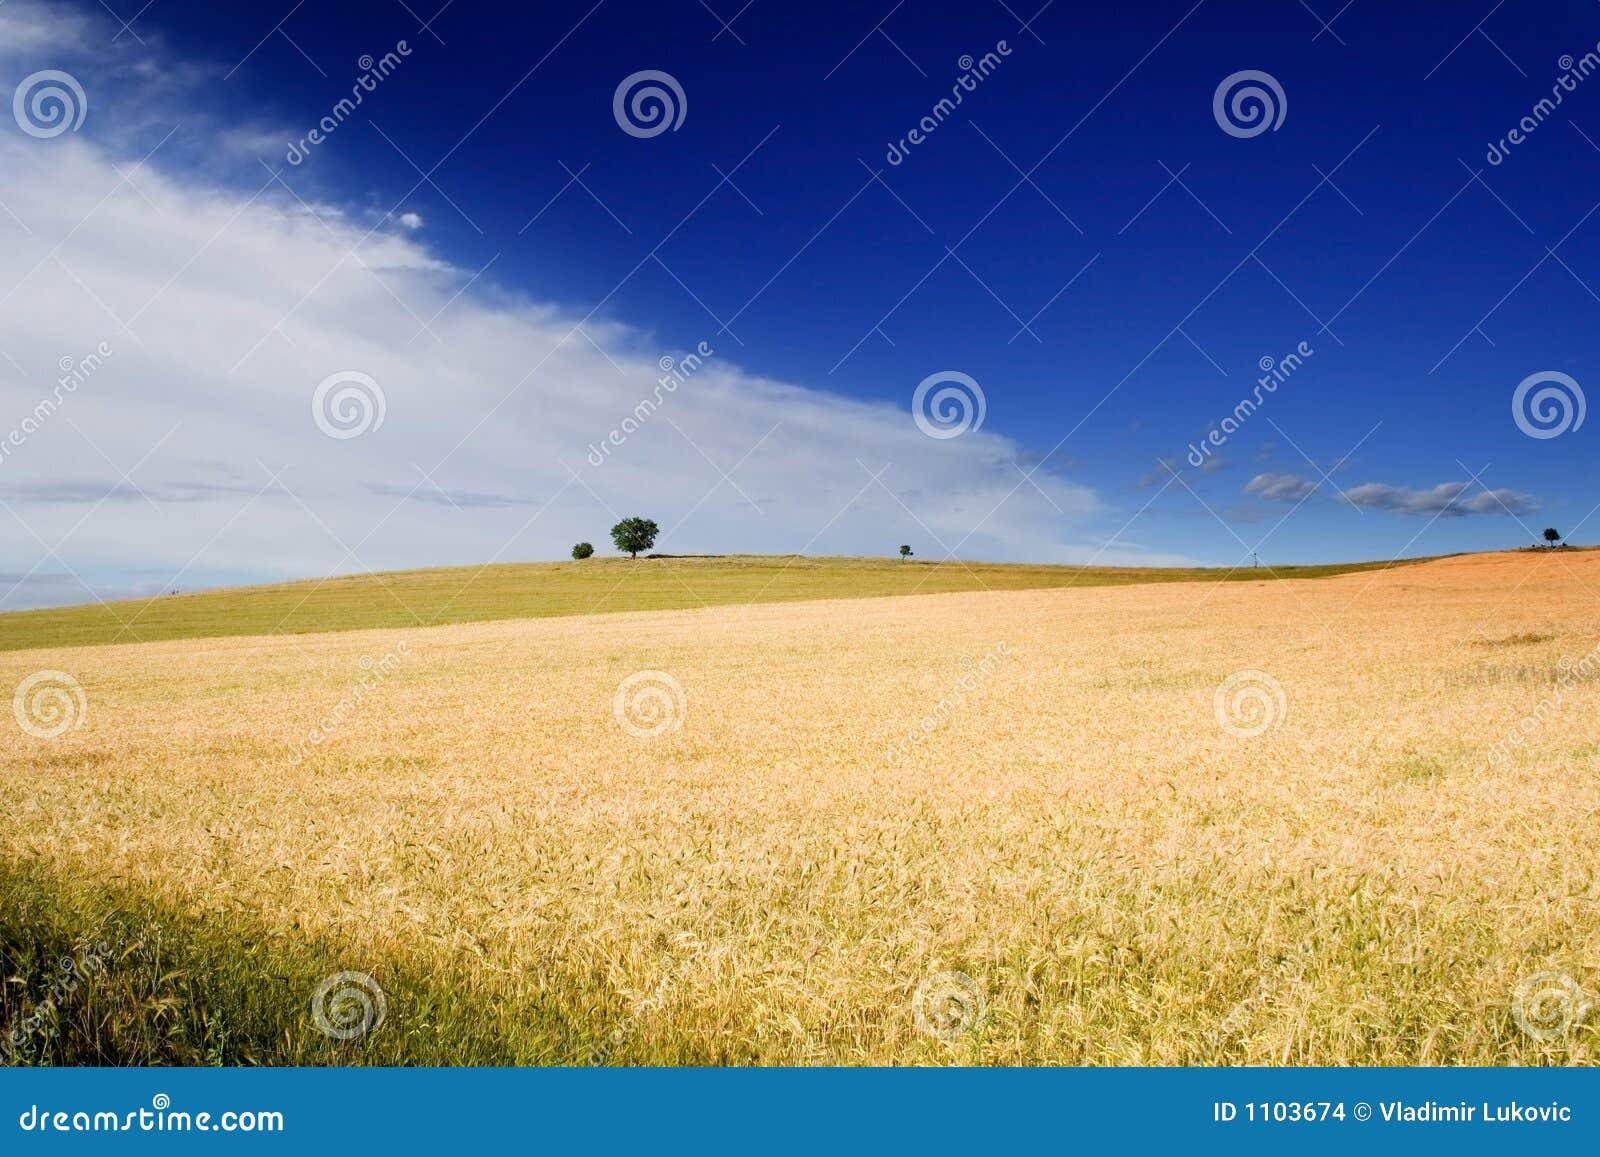 Wheatfield and a tree